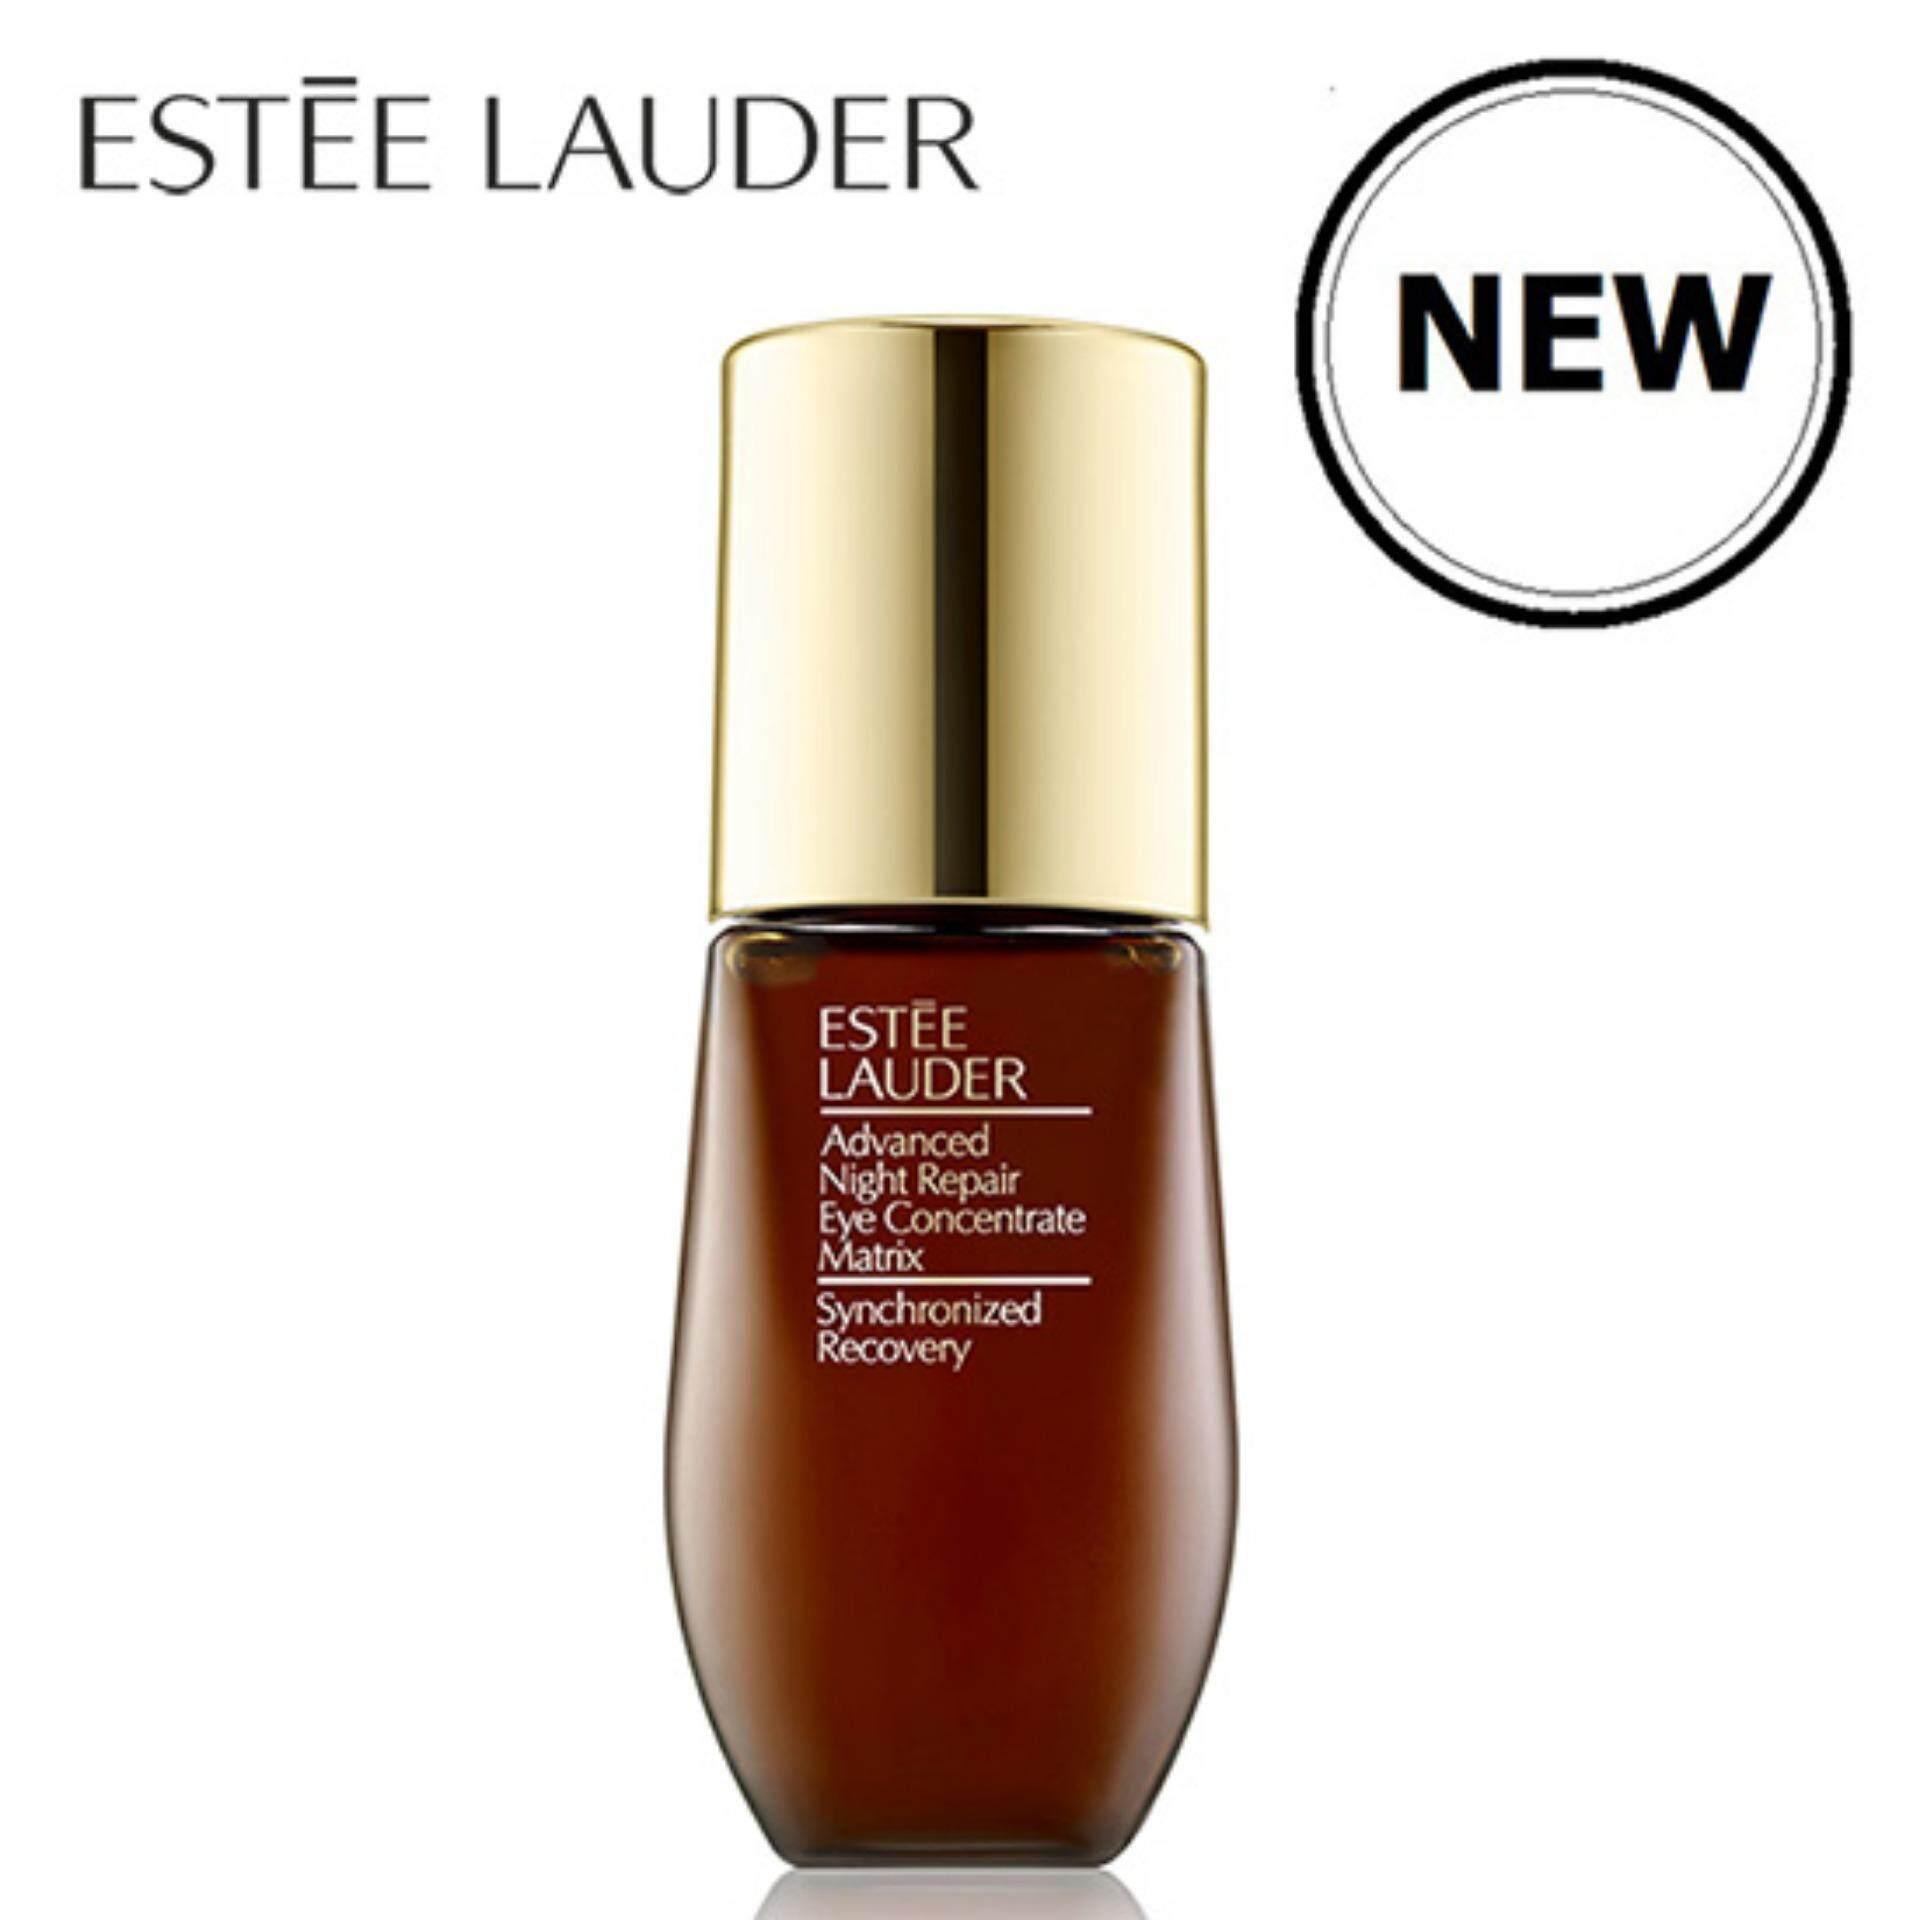 Estee Lauder Advanced Night Repair Eye Concentrate Matrix 5ml อายเซรั่มตัวใหม่ล่าสุดของเอสเต้